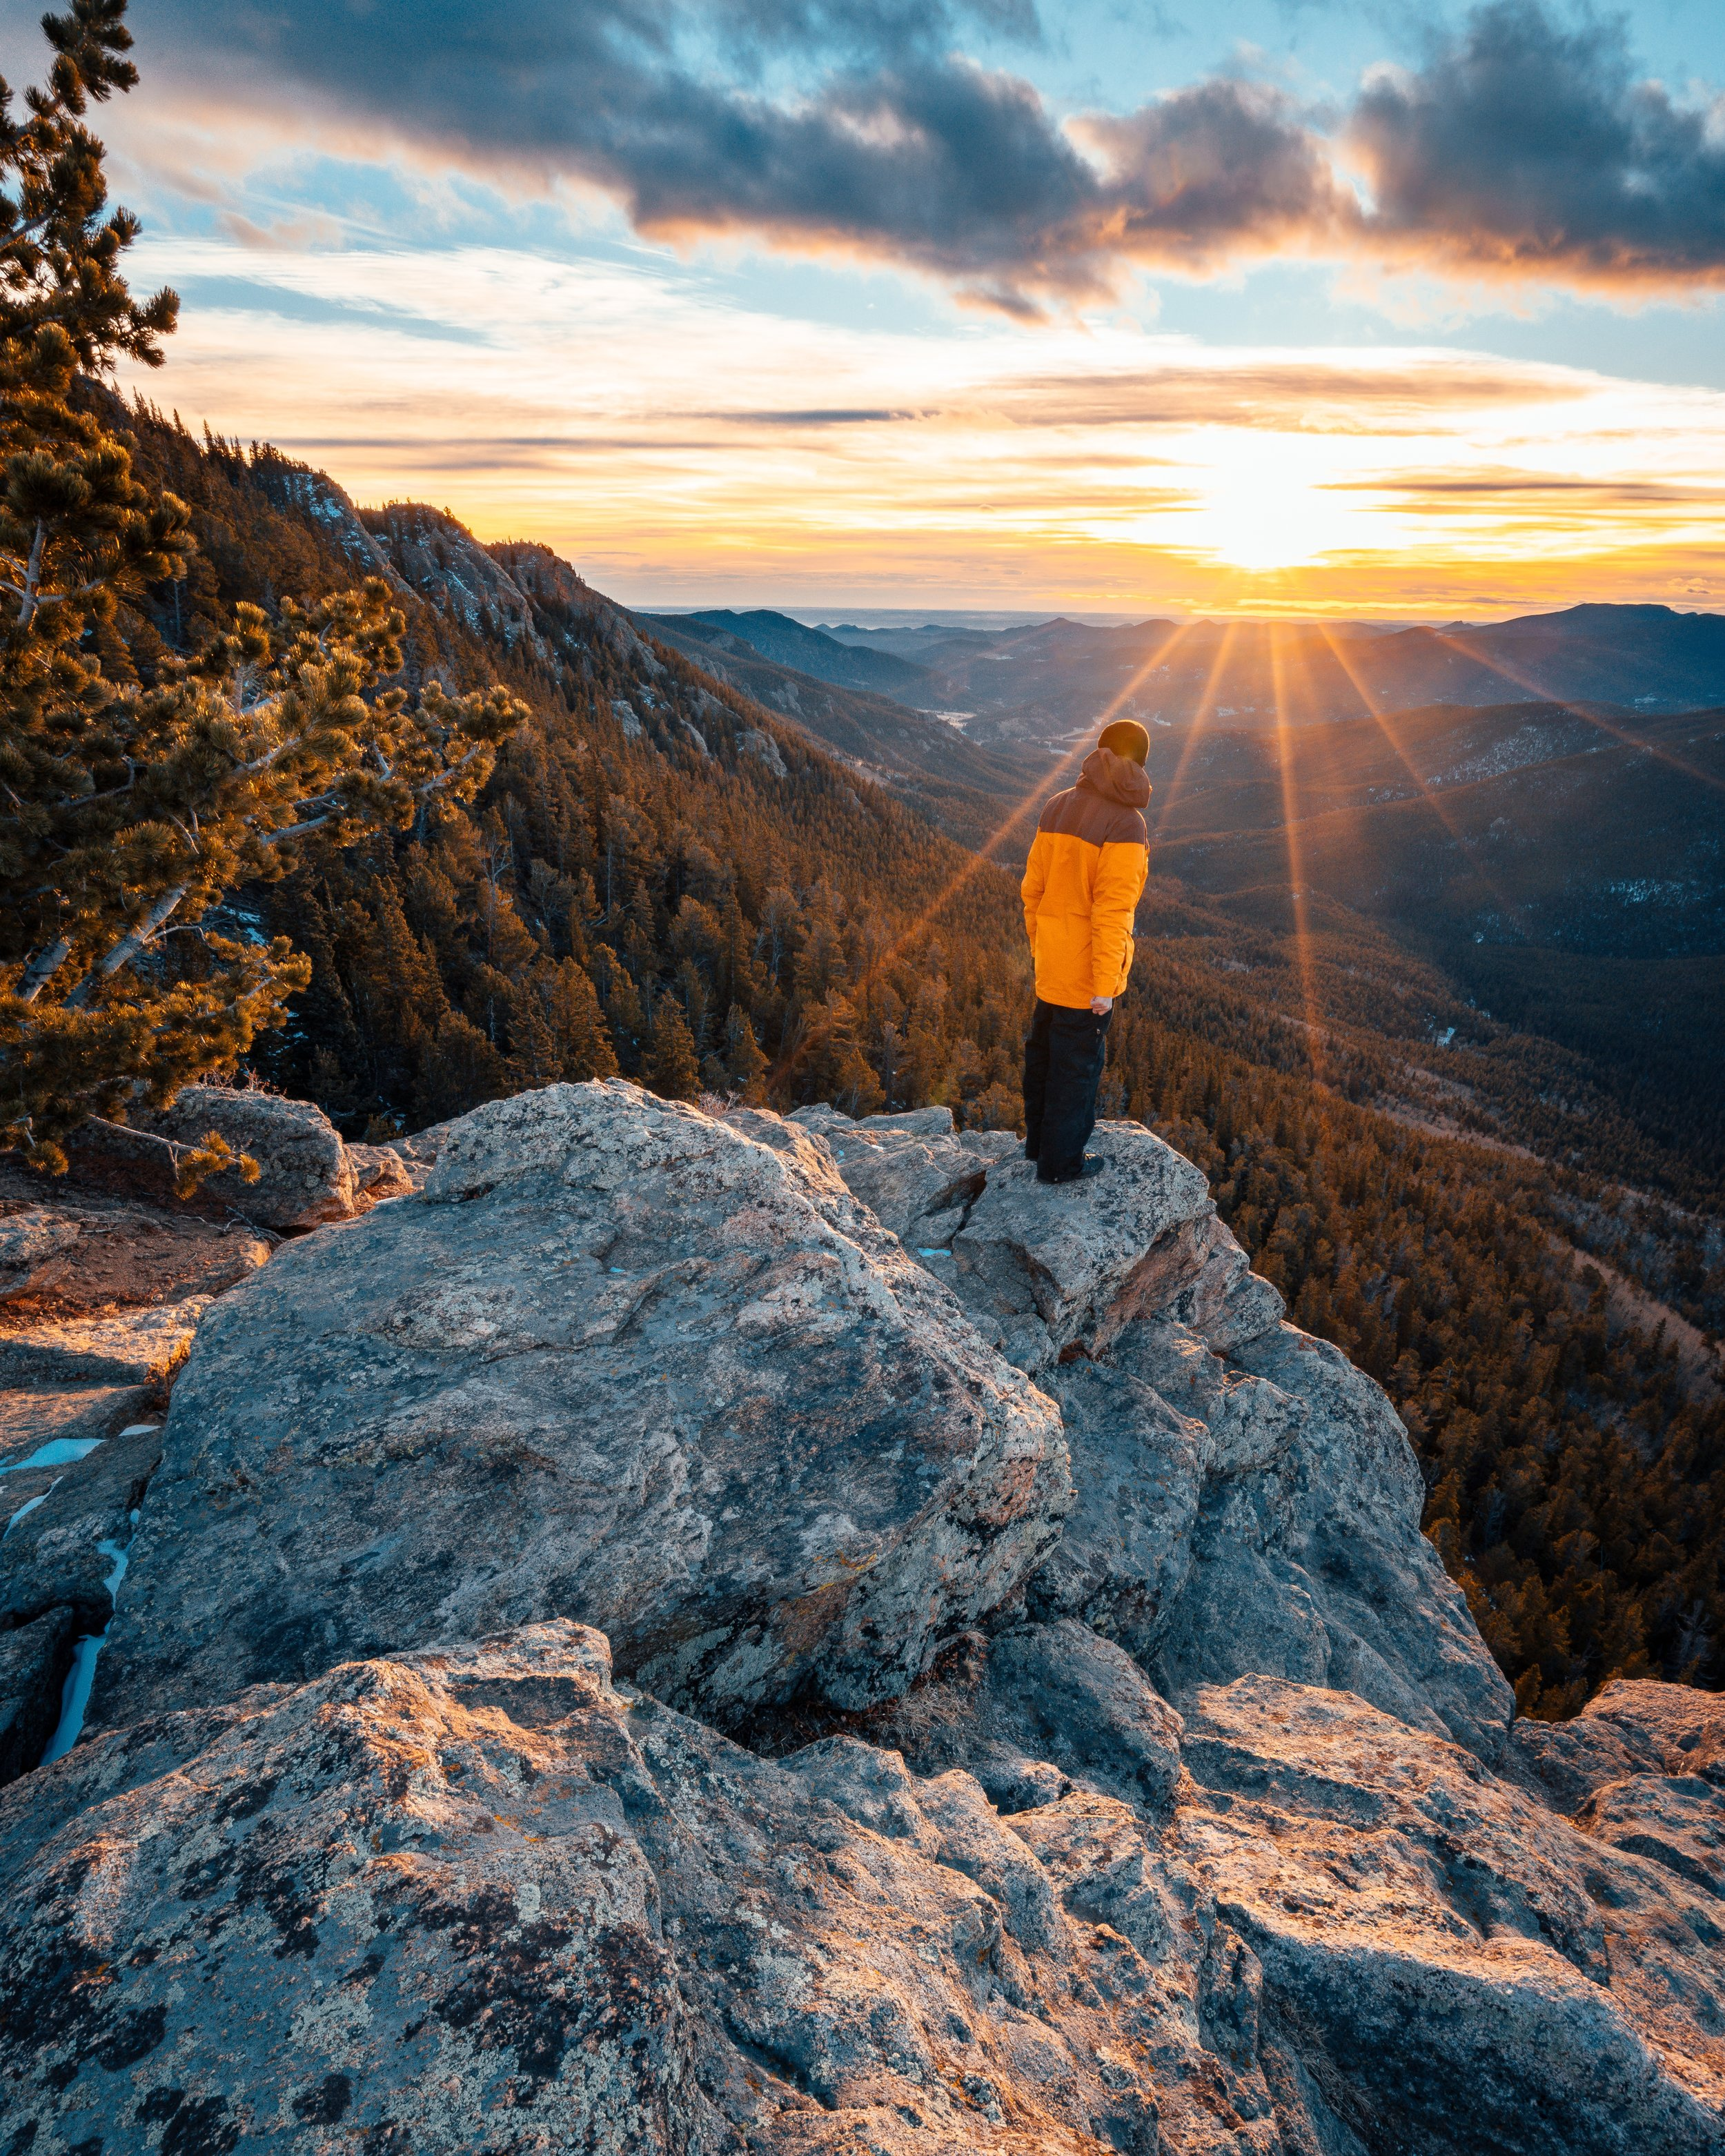 MT. EVANS WILDERNESS, CLEAR CREEK COUNTY, COLORADO